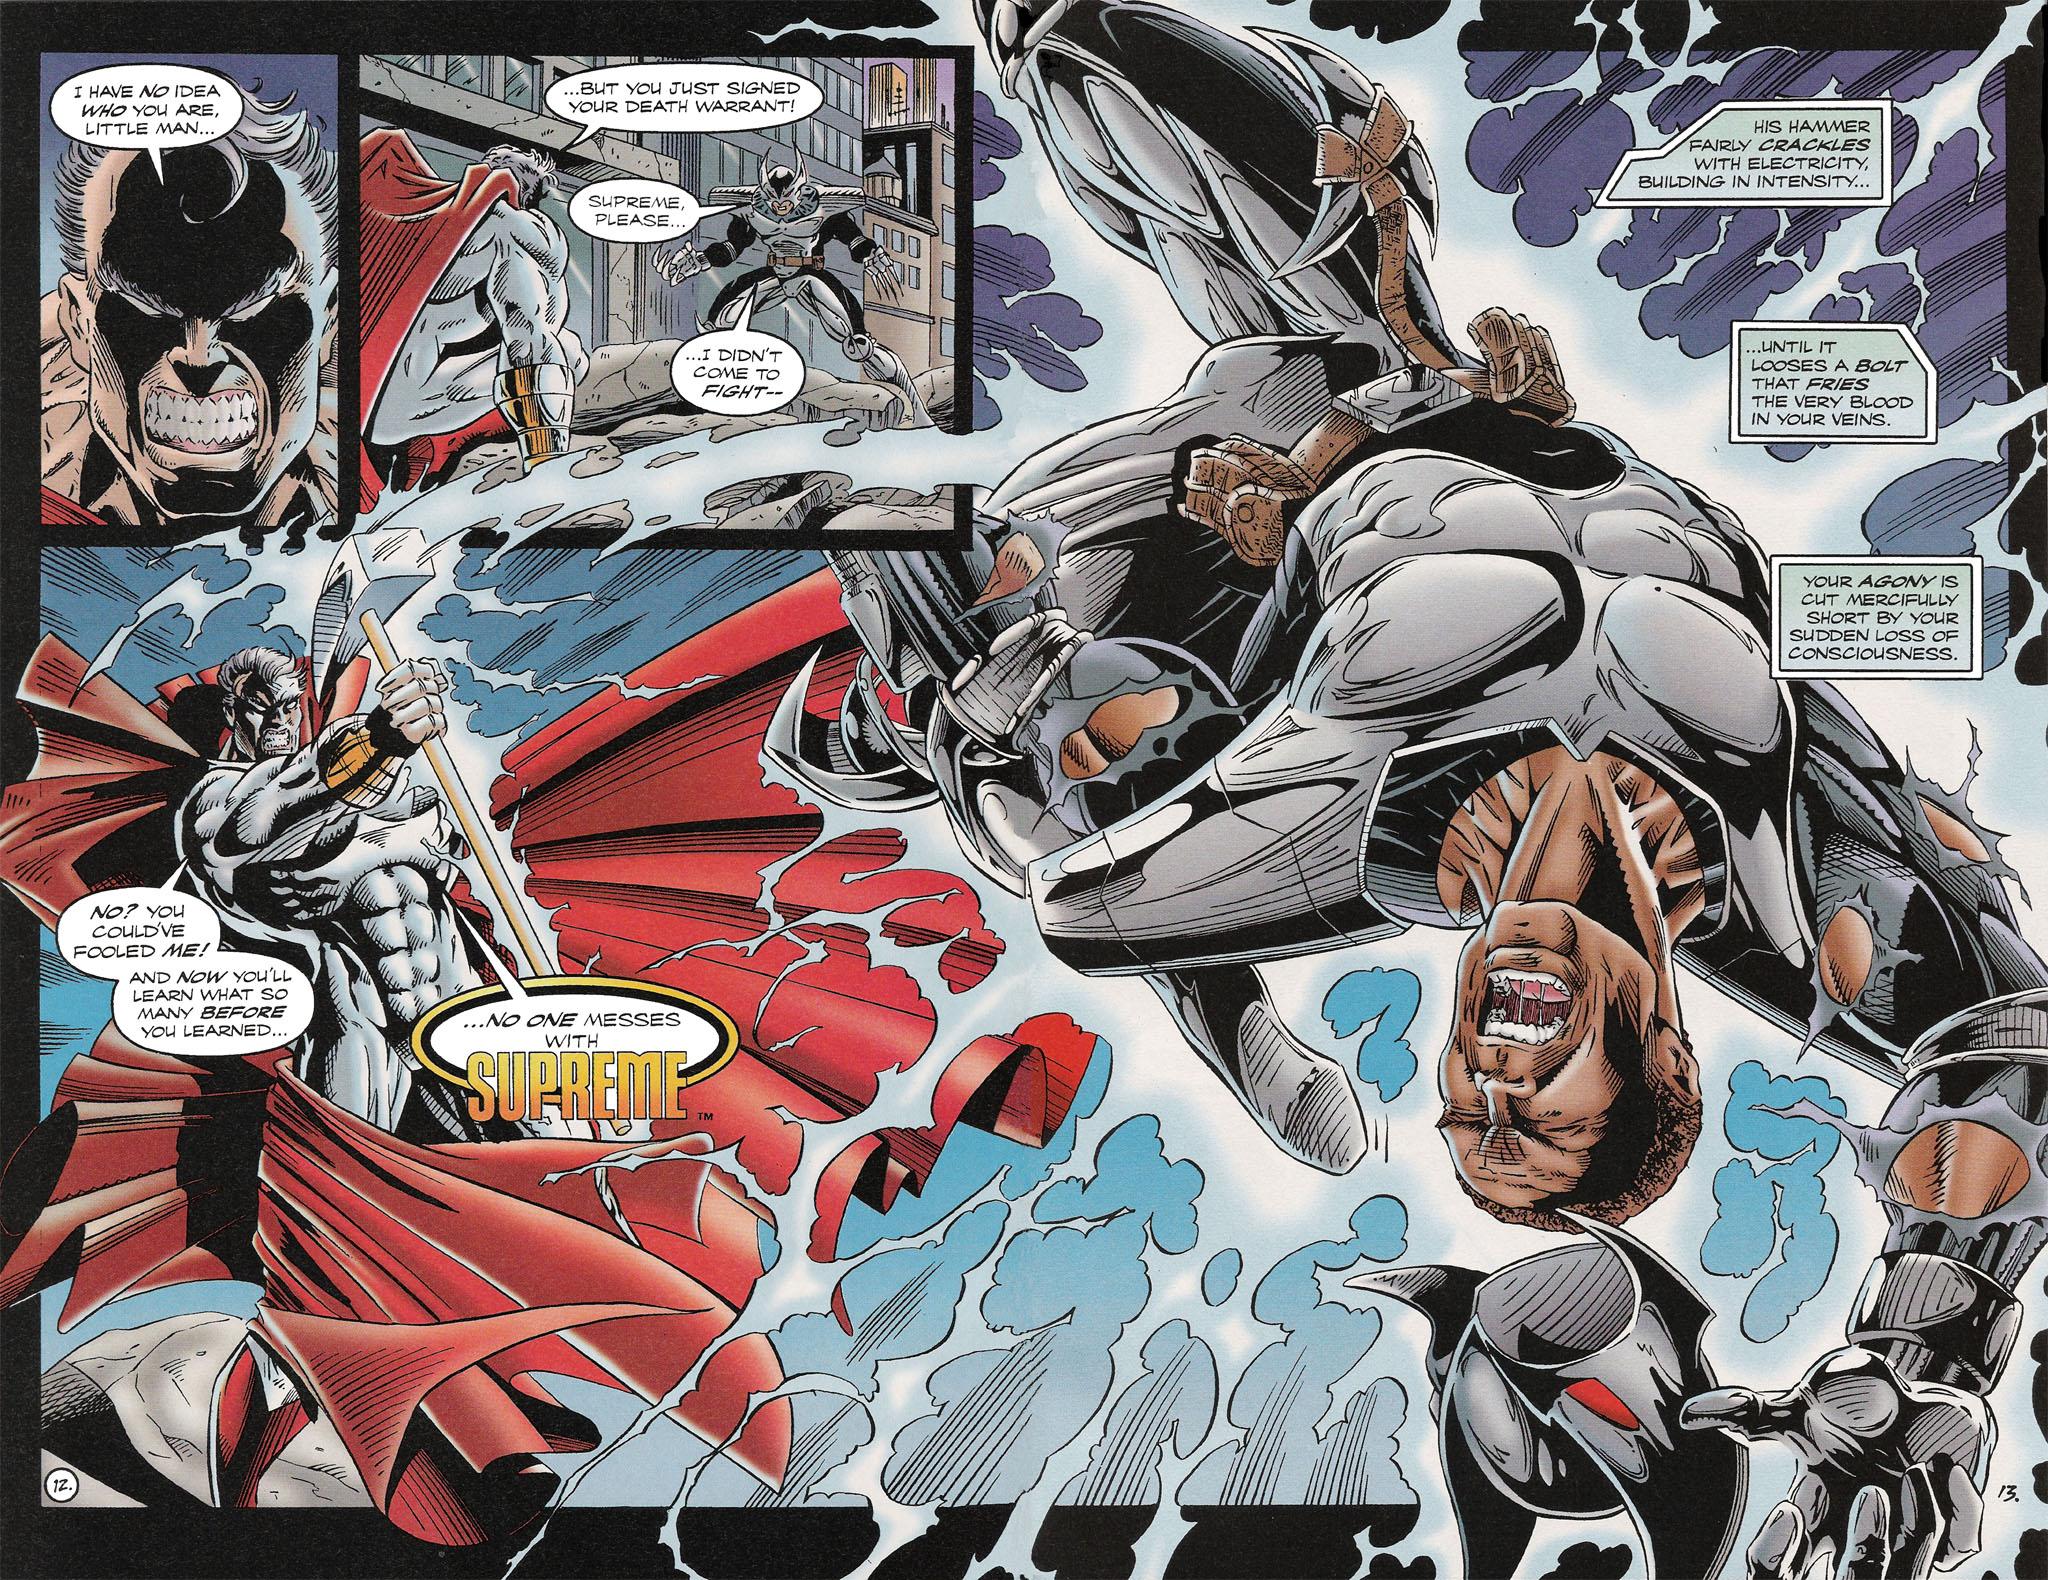 Read online ShadowHawk comic -  Issue #16 - 10